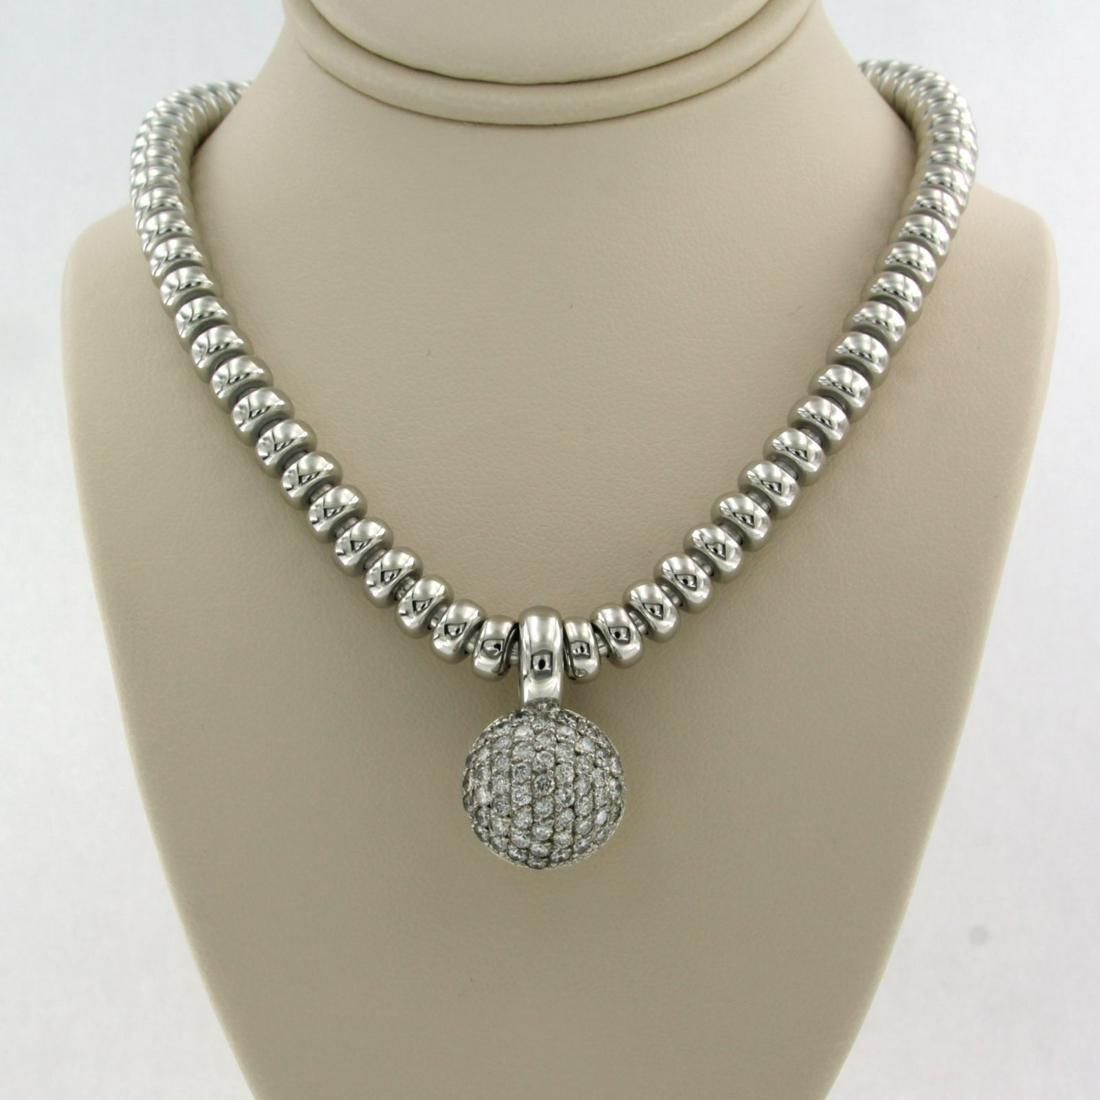 LeChic - Diamond necklace